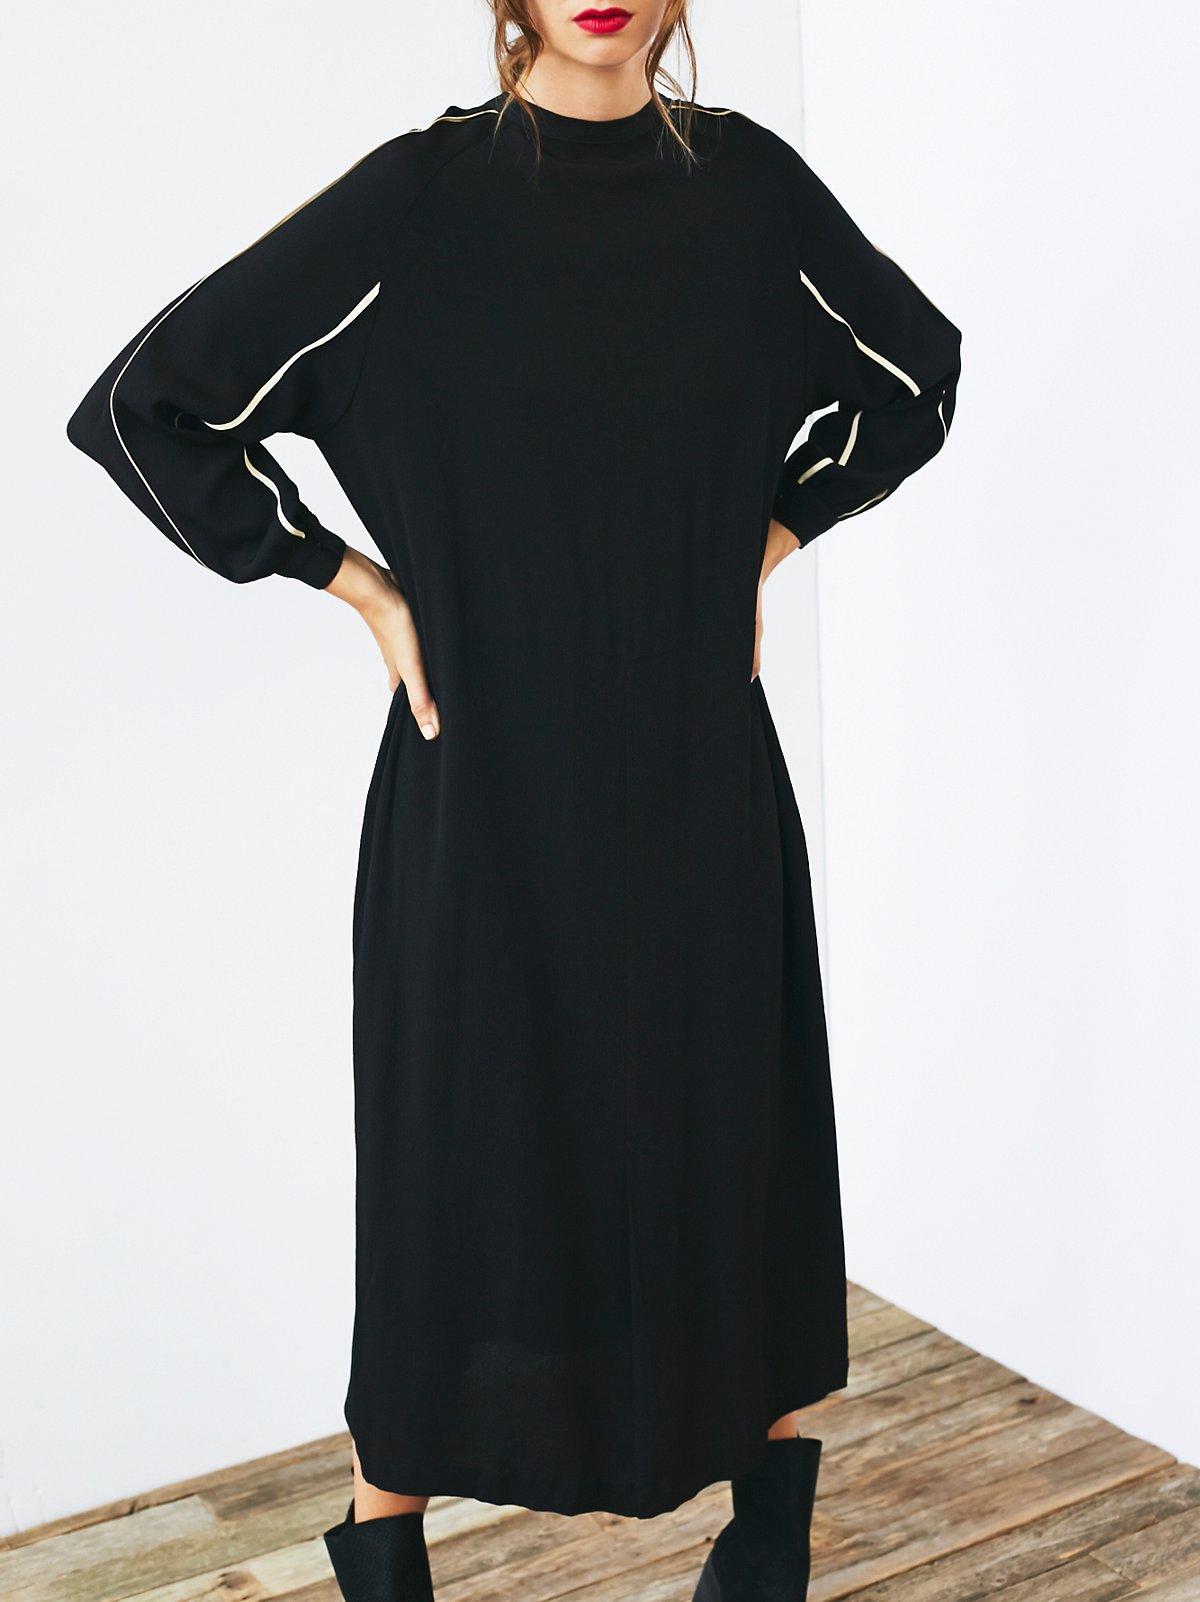 Vintage 1930s Long Sleeve Dress